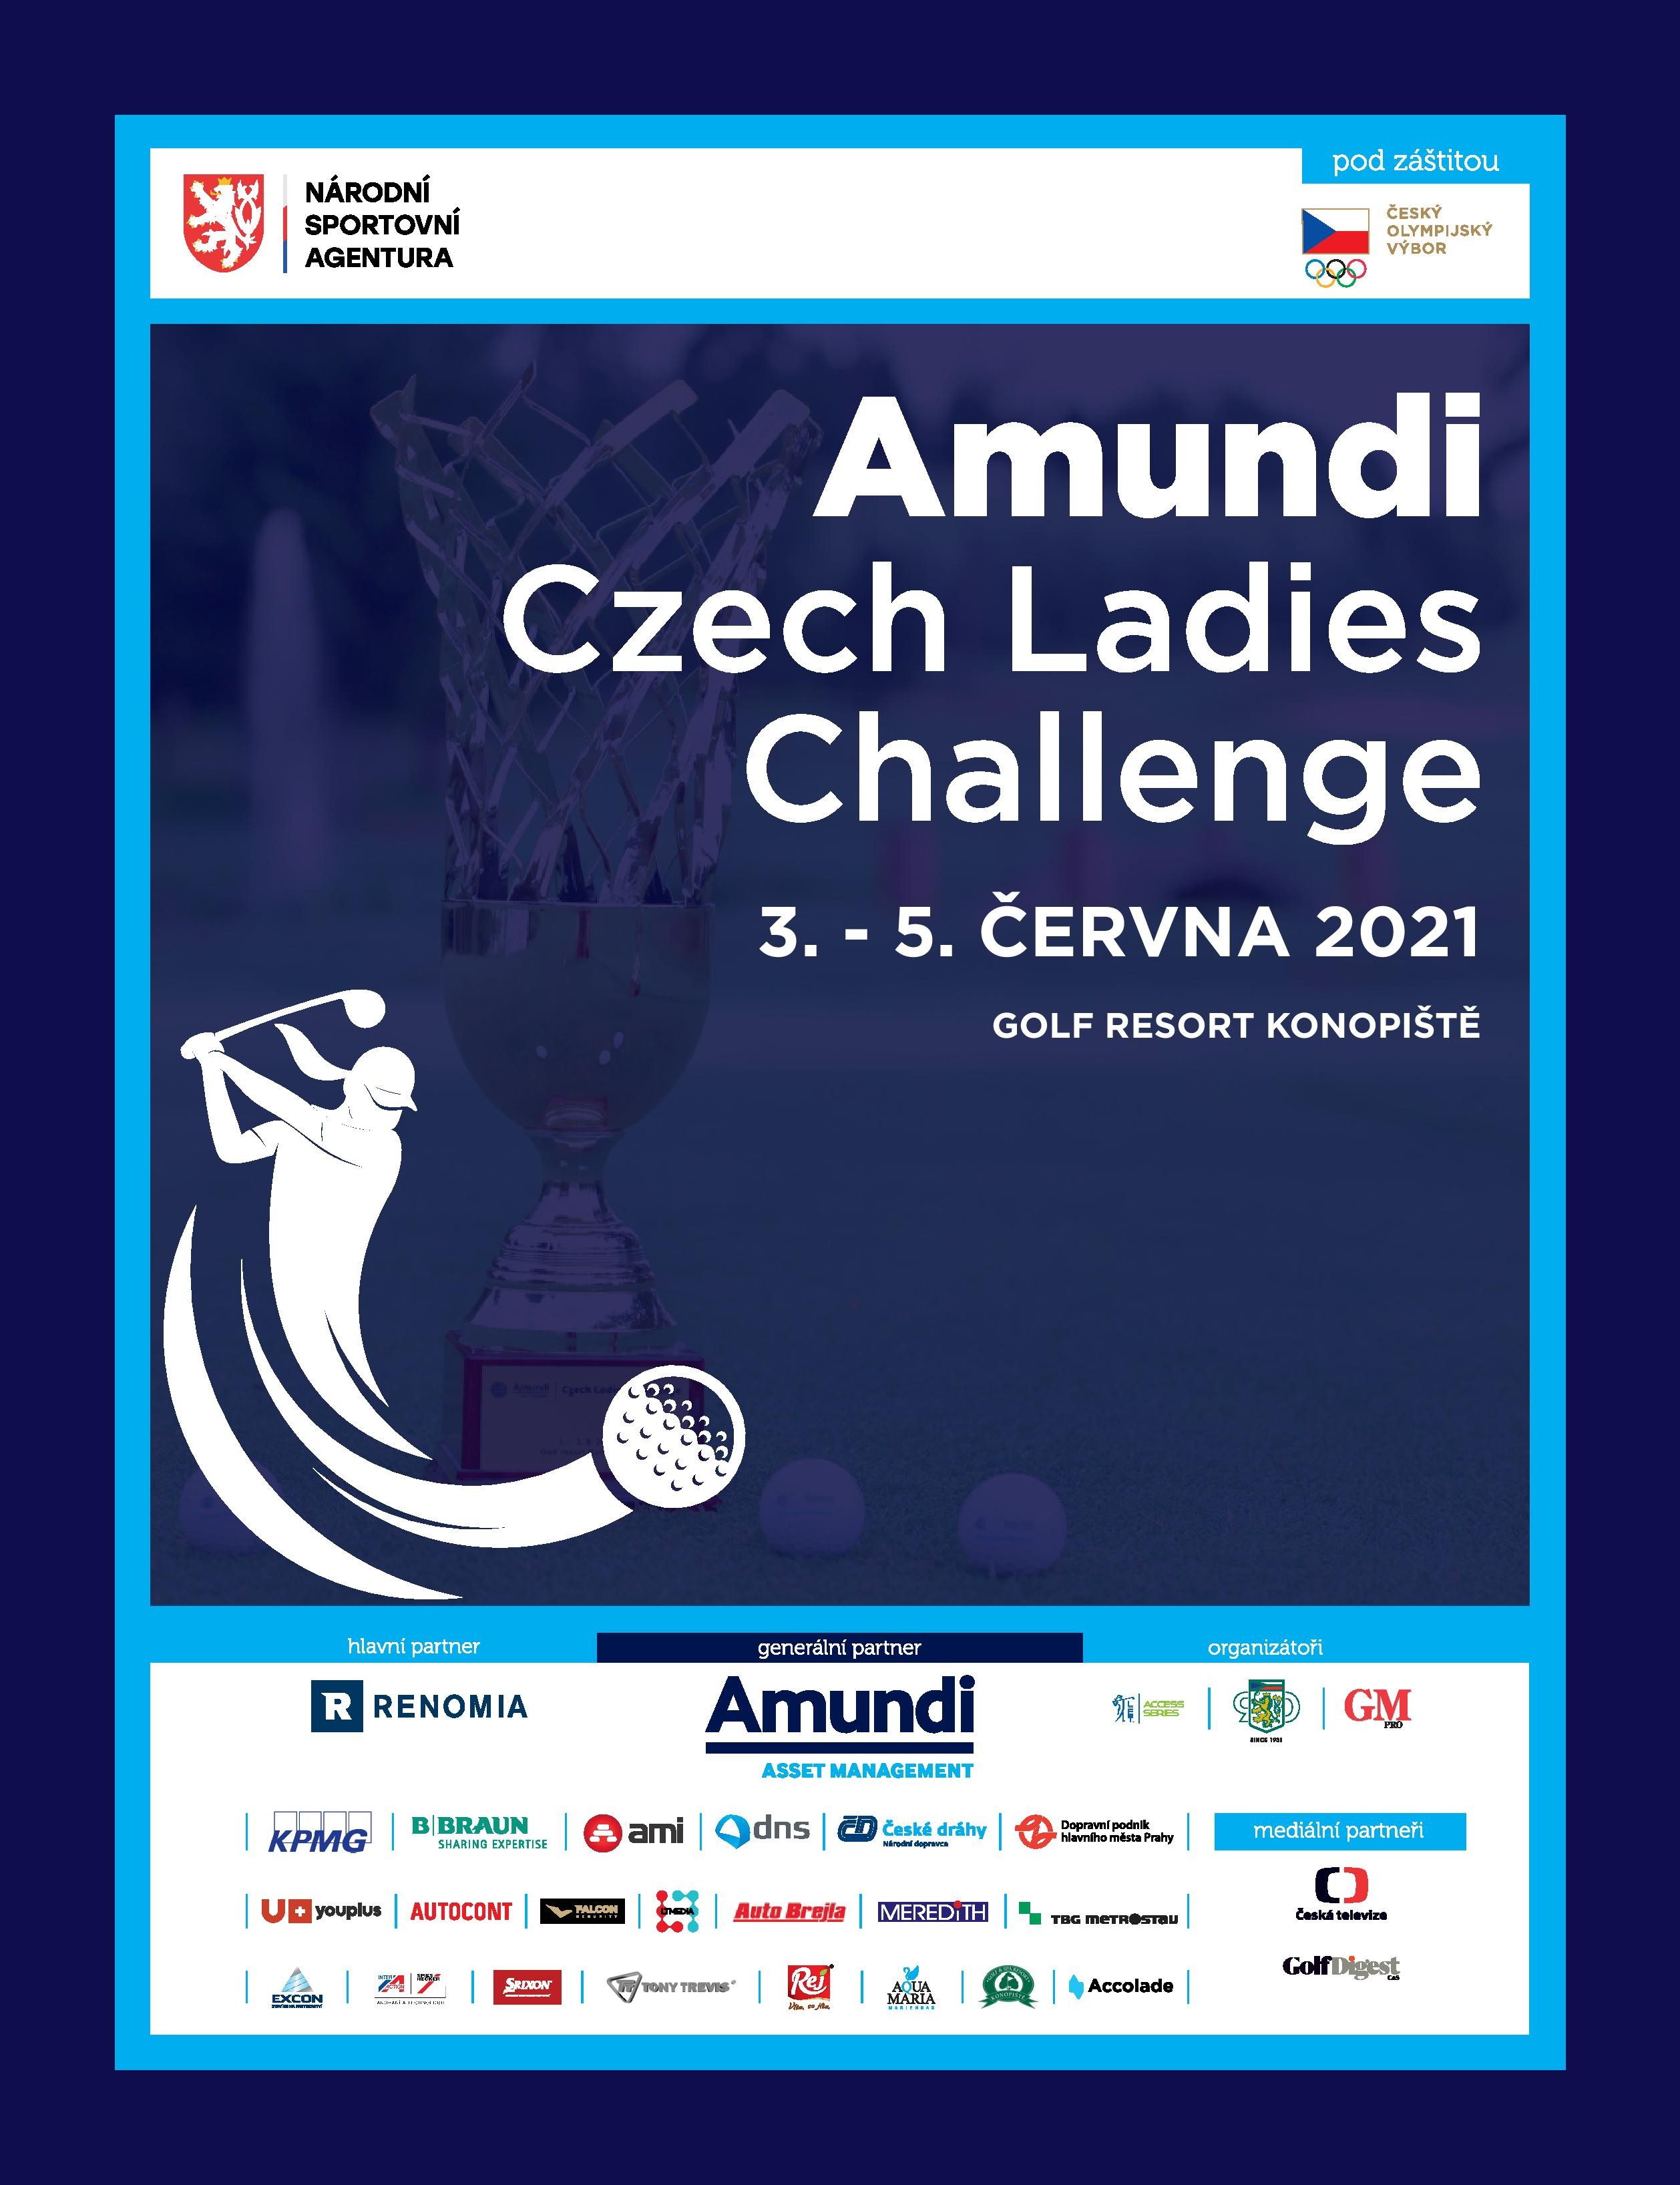 Amundi Czech Ladies Challenge 2021